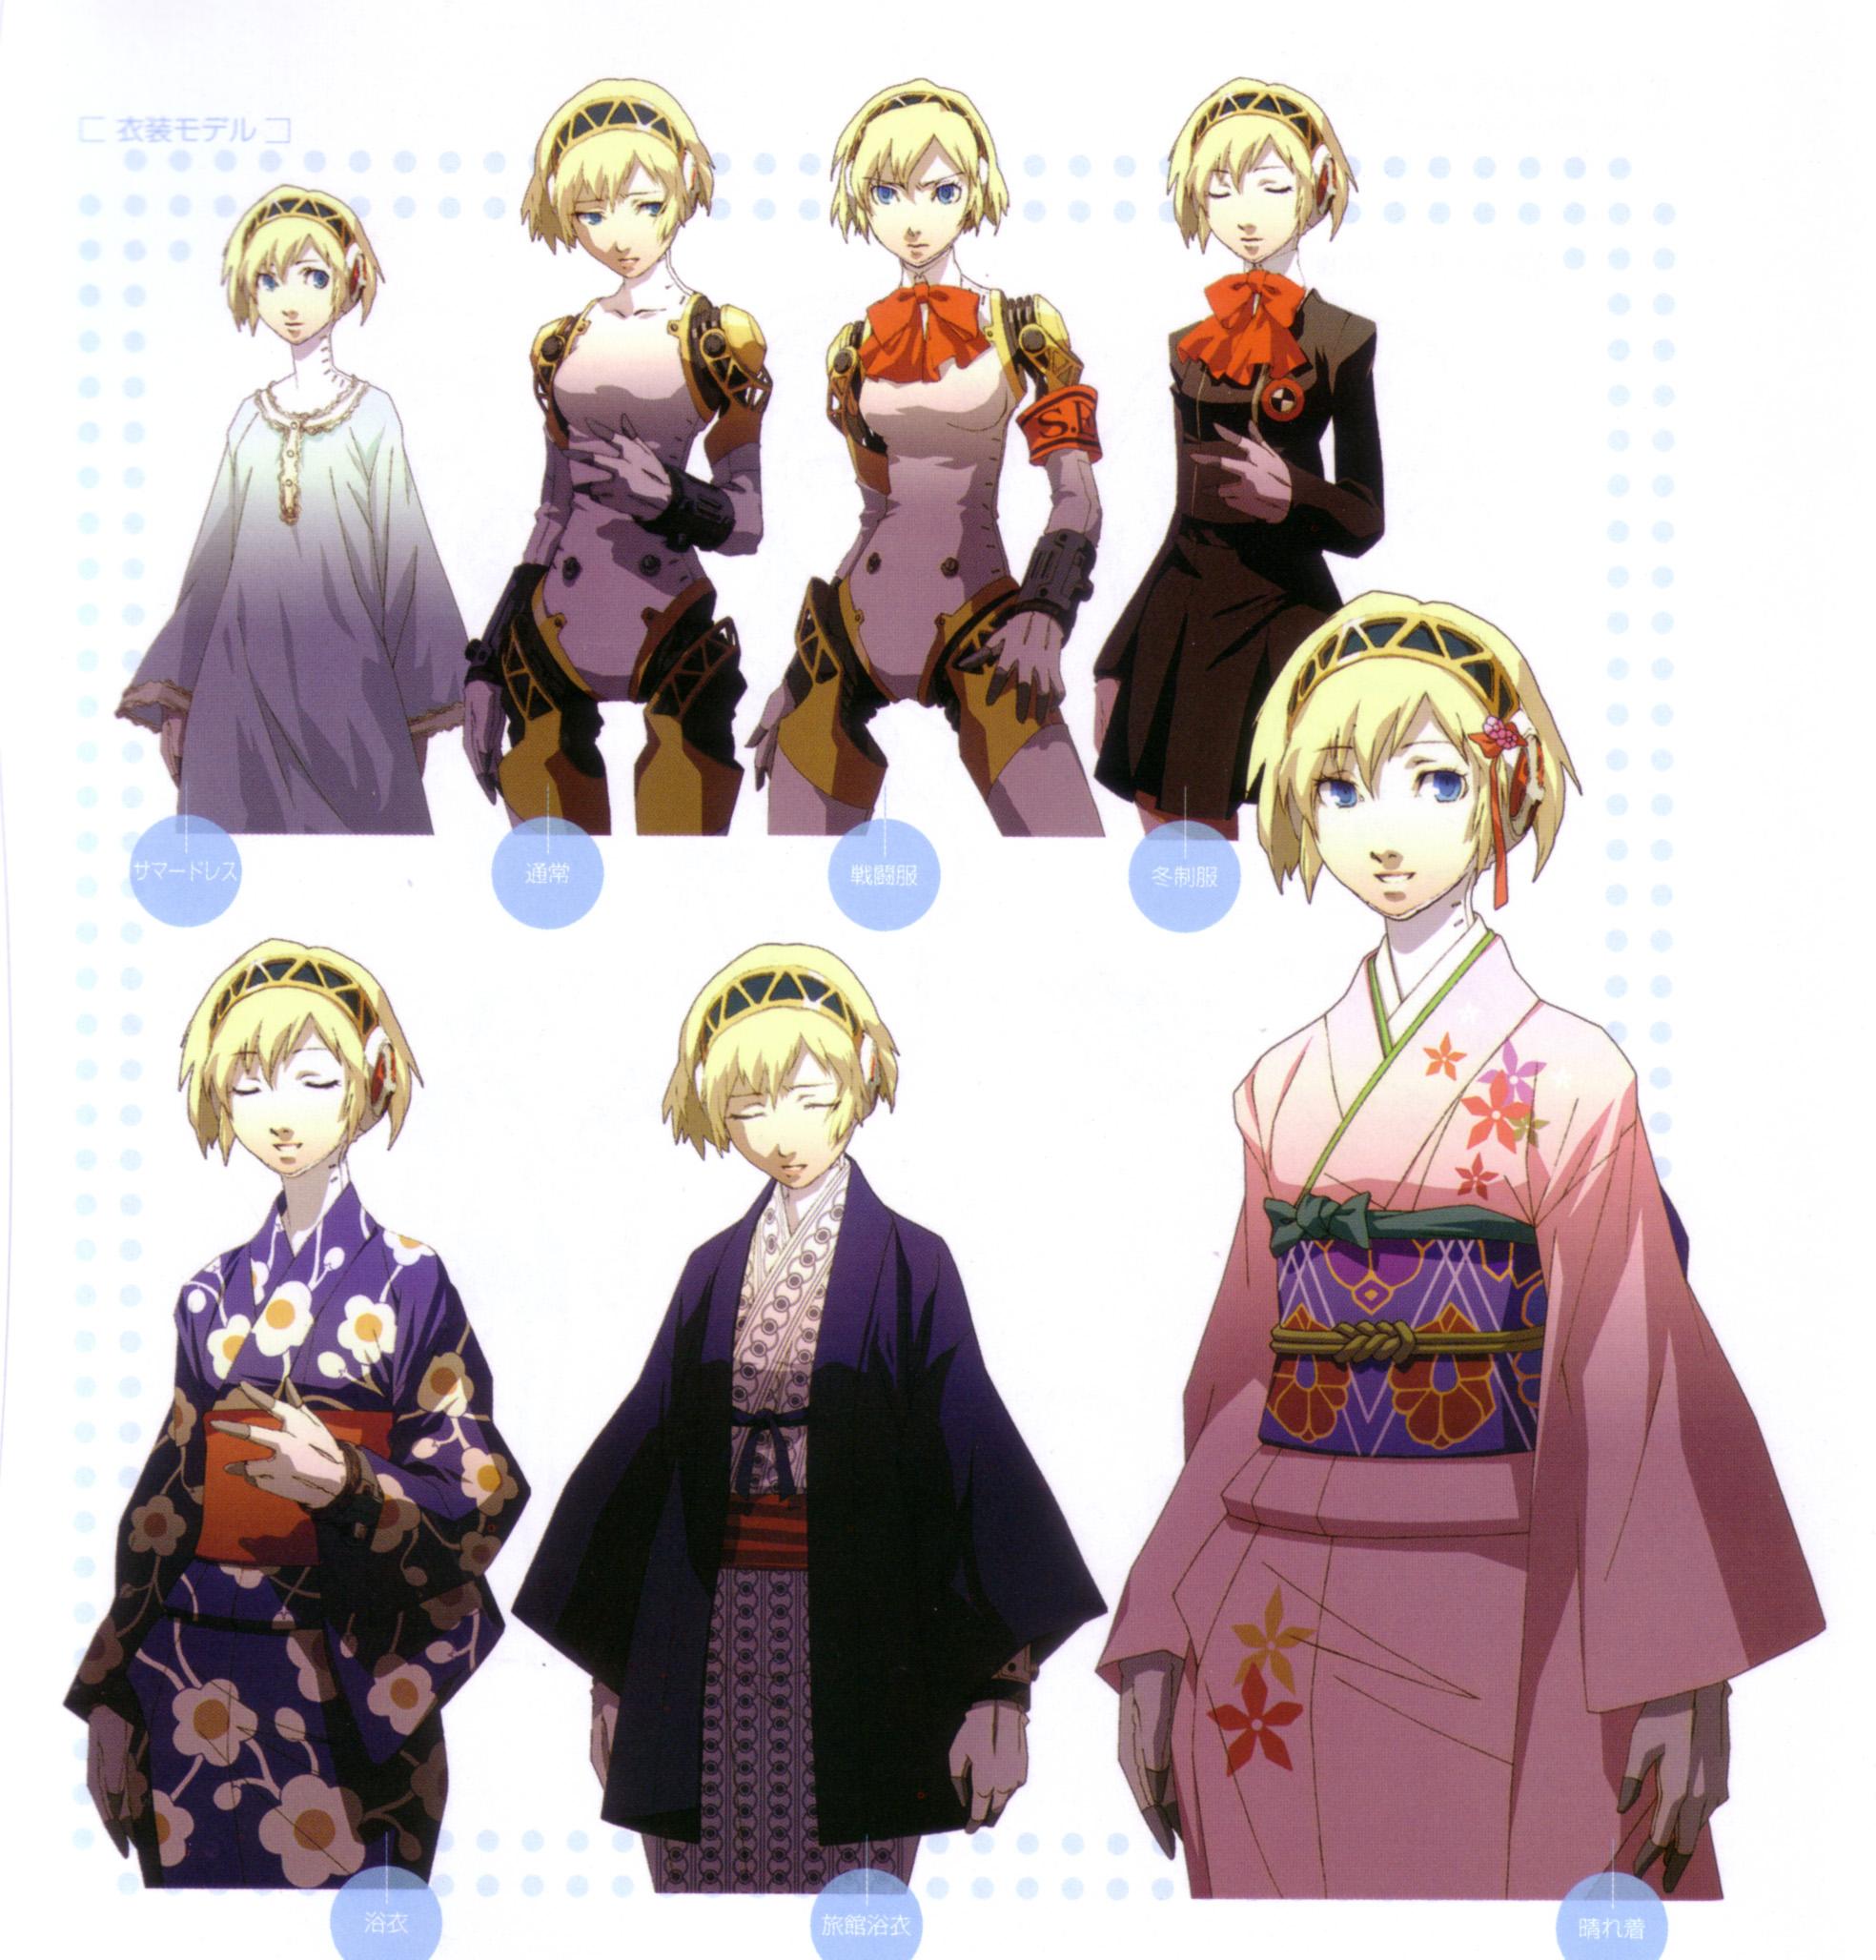 Lewd Anime Girls Wallpaper Aigis Persona 4 Arena